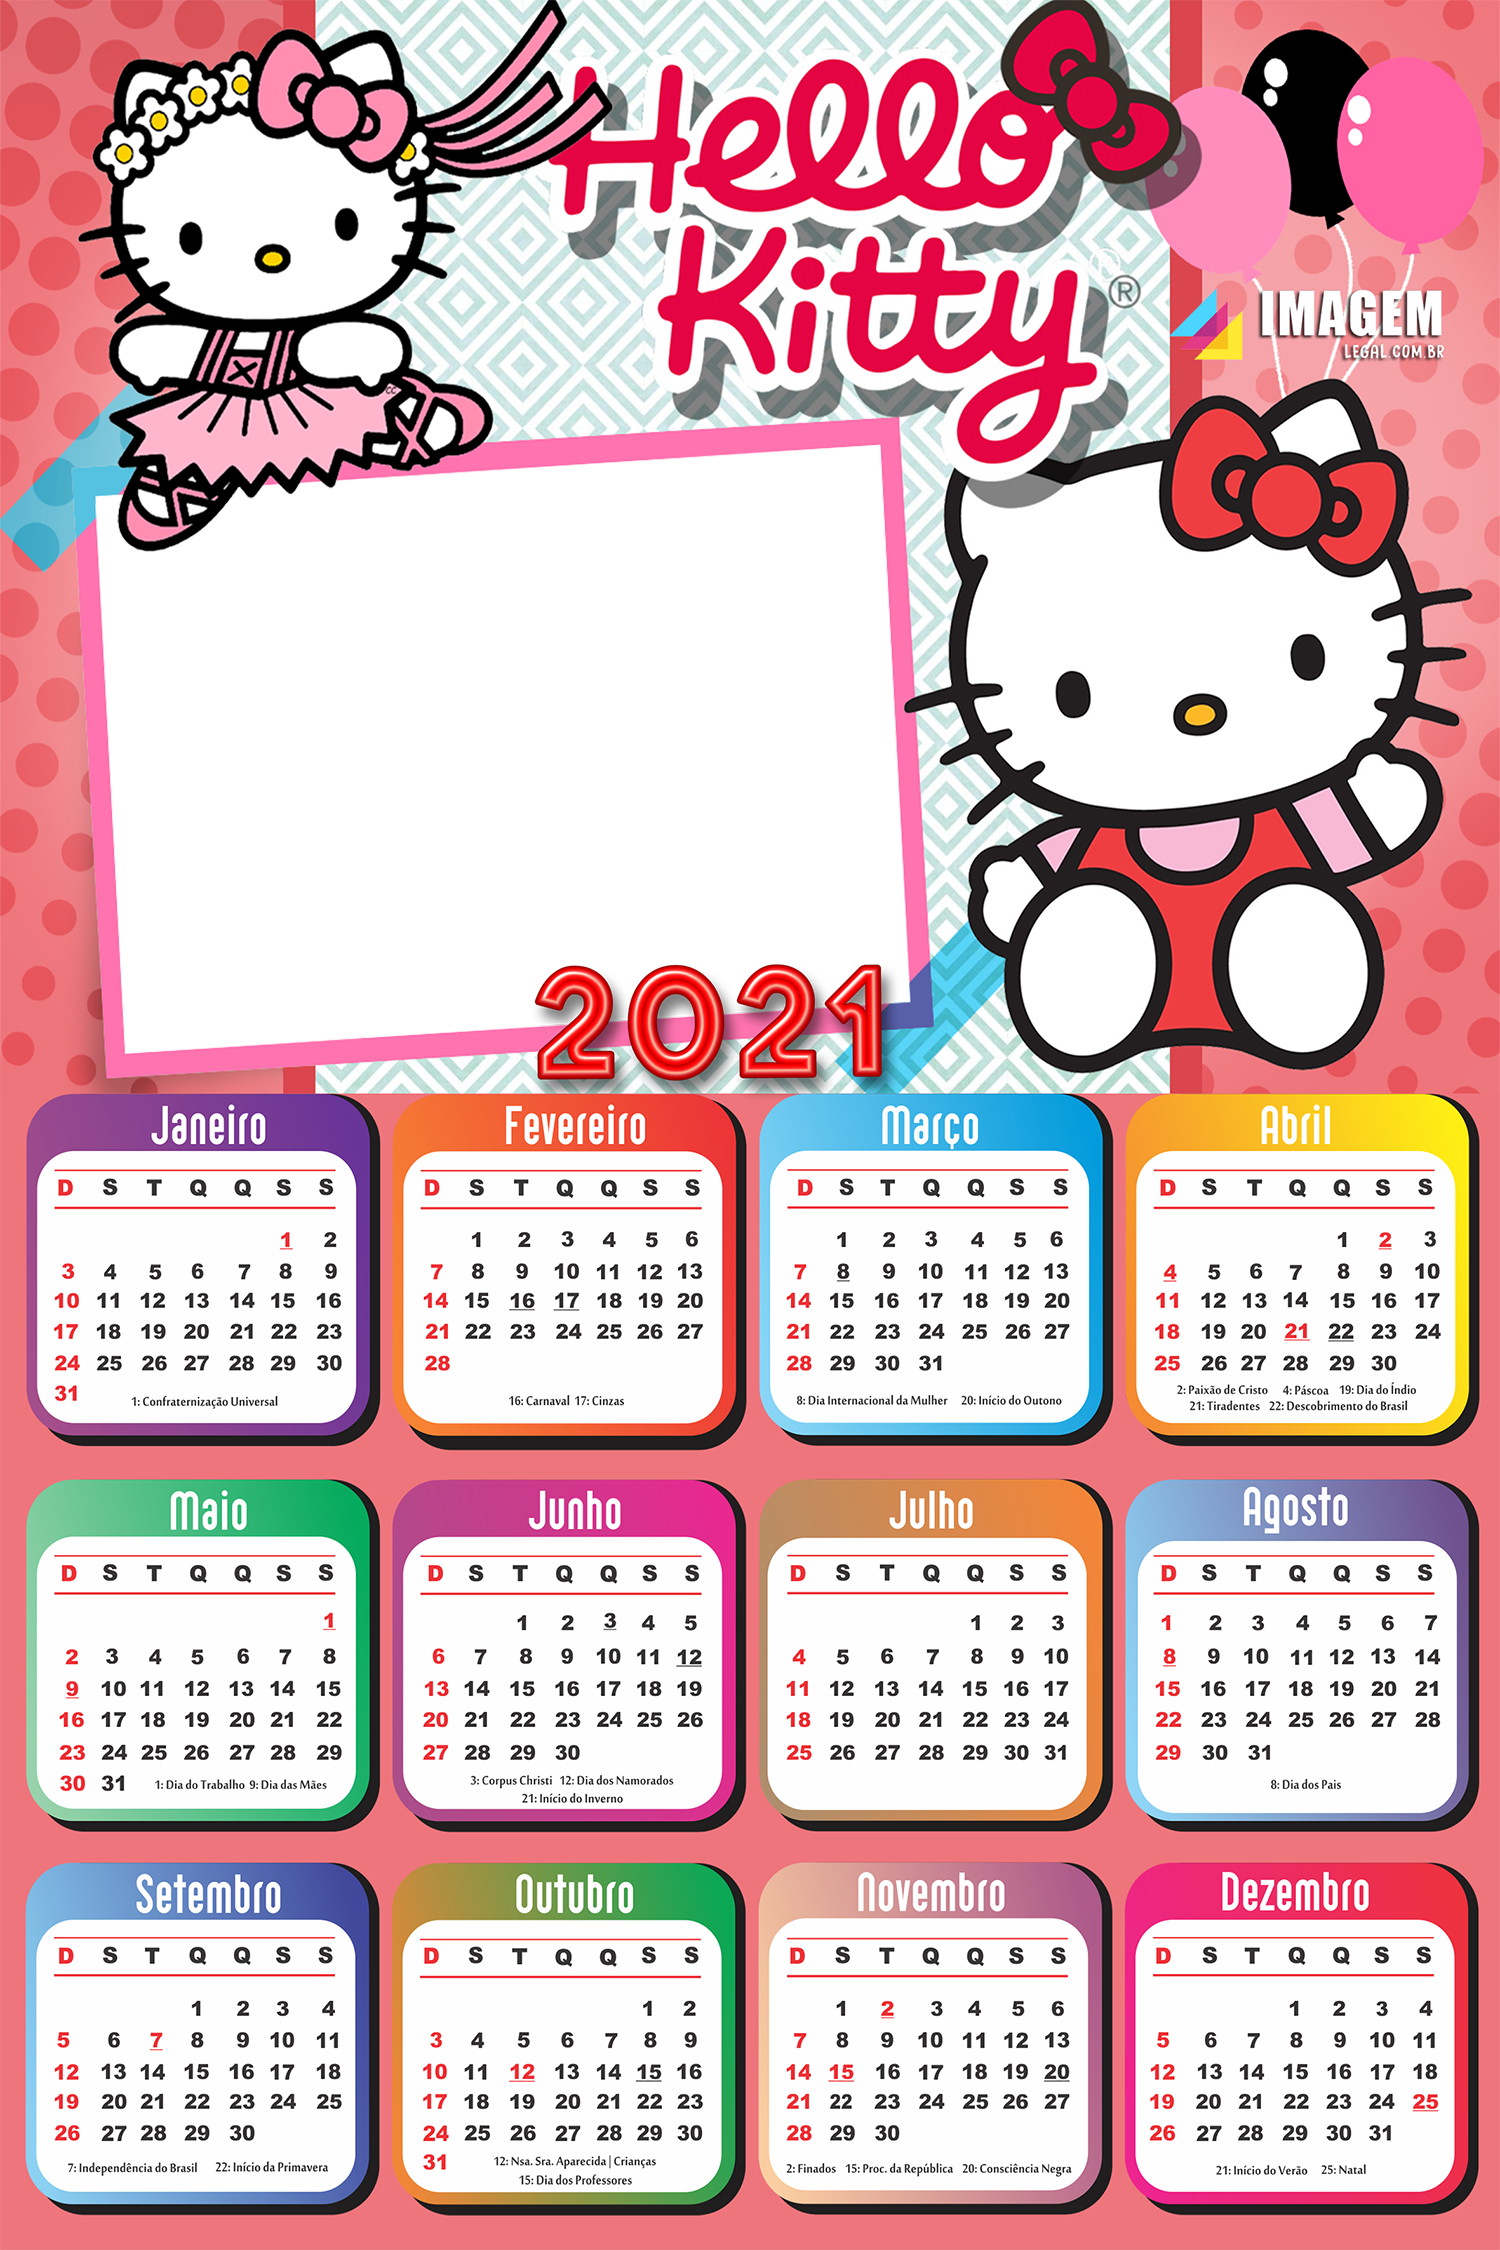 Calendario Anime 2021 Para Imprimir | Wallpaper Site